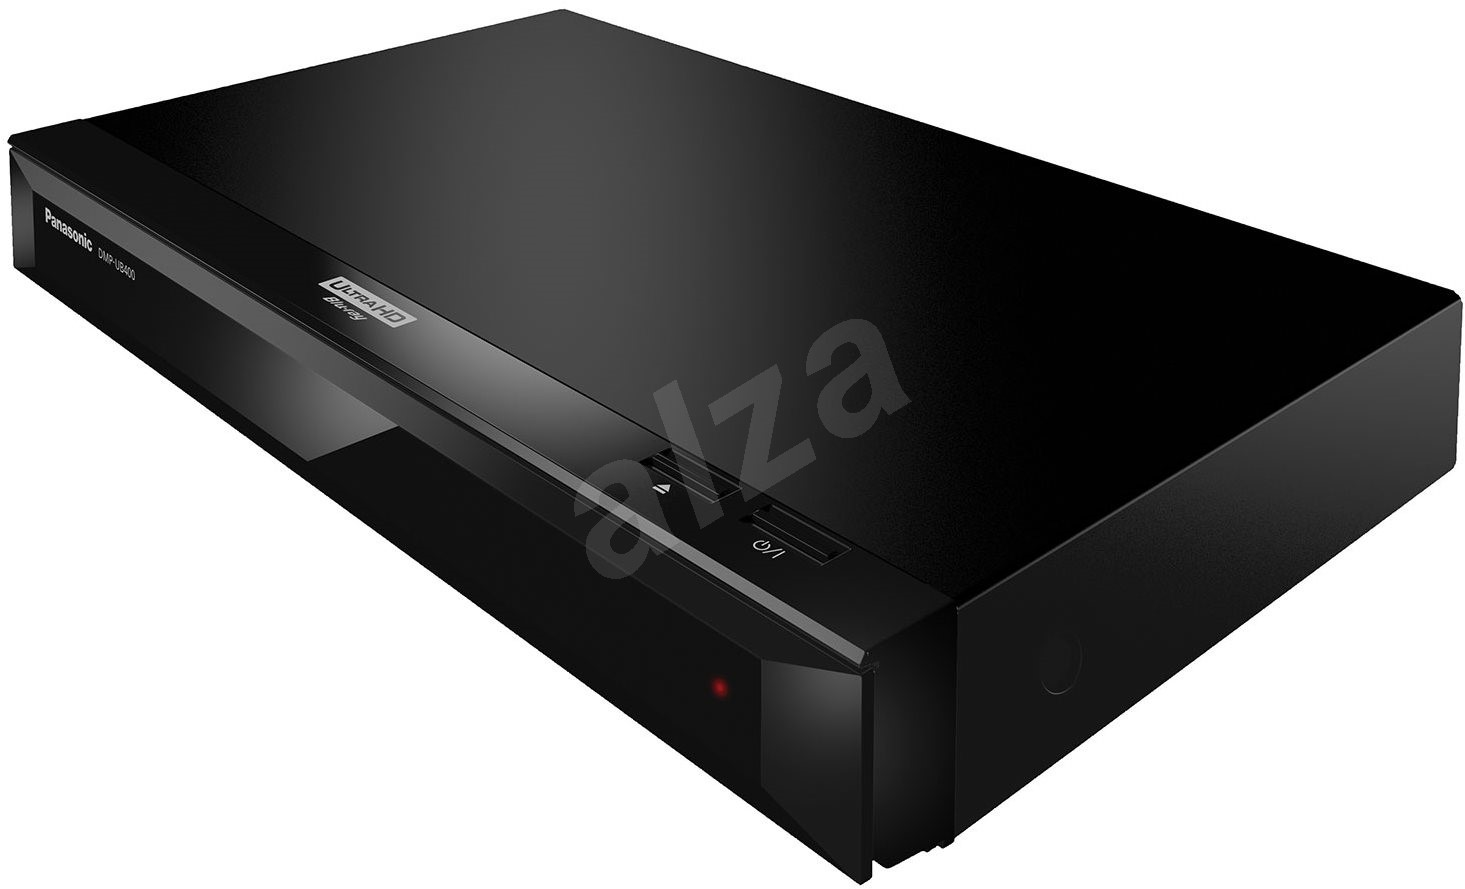 panasonic dmp ub400egk blue ray player. Black Bedroom Furniture Sets. Home Design Ideas